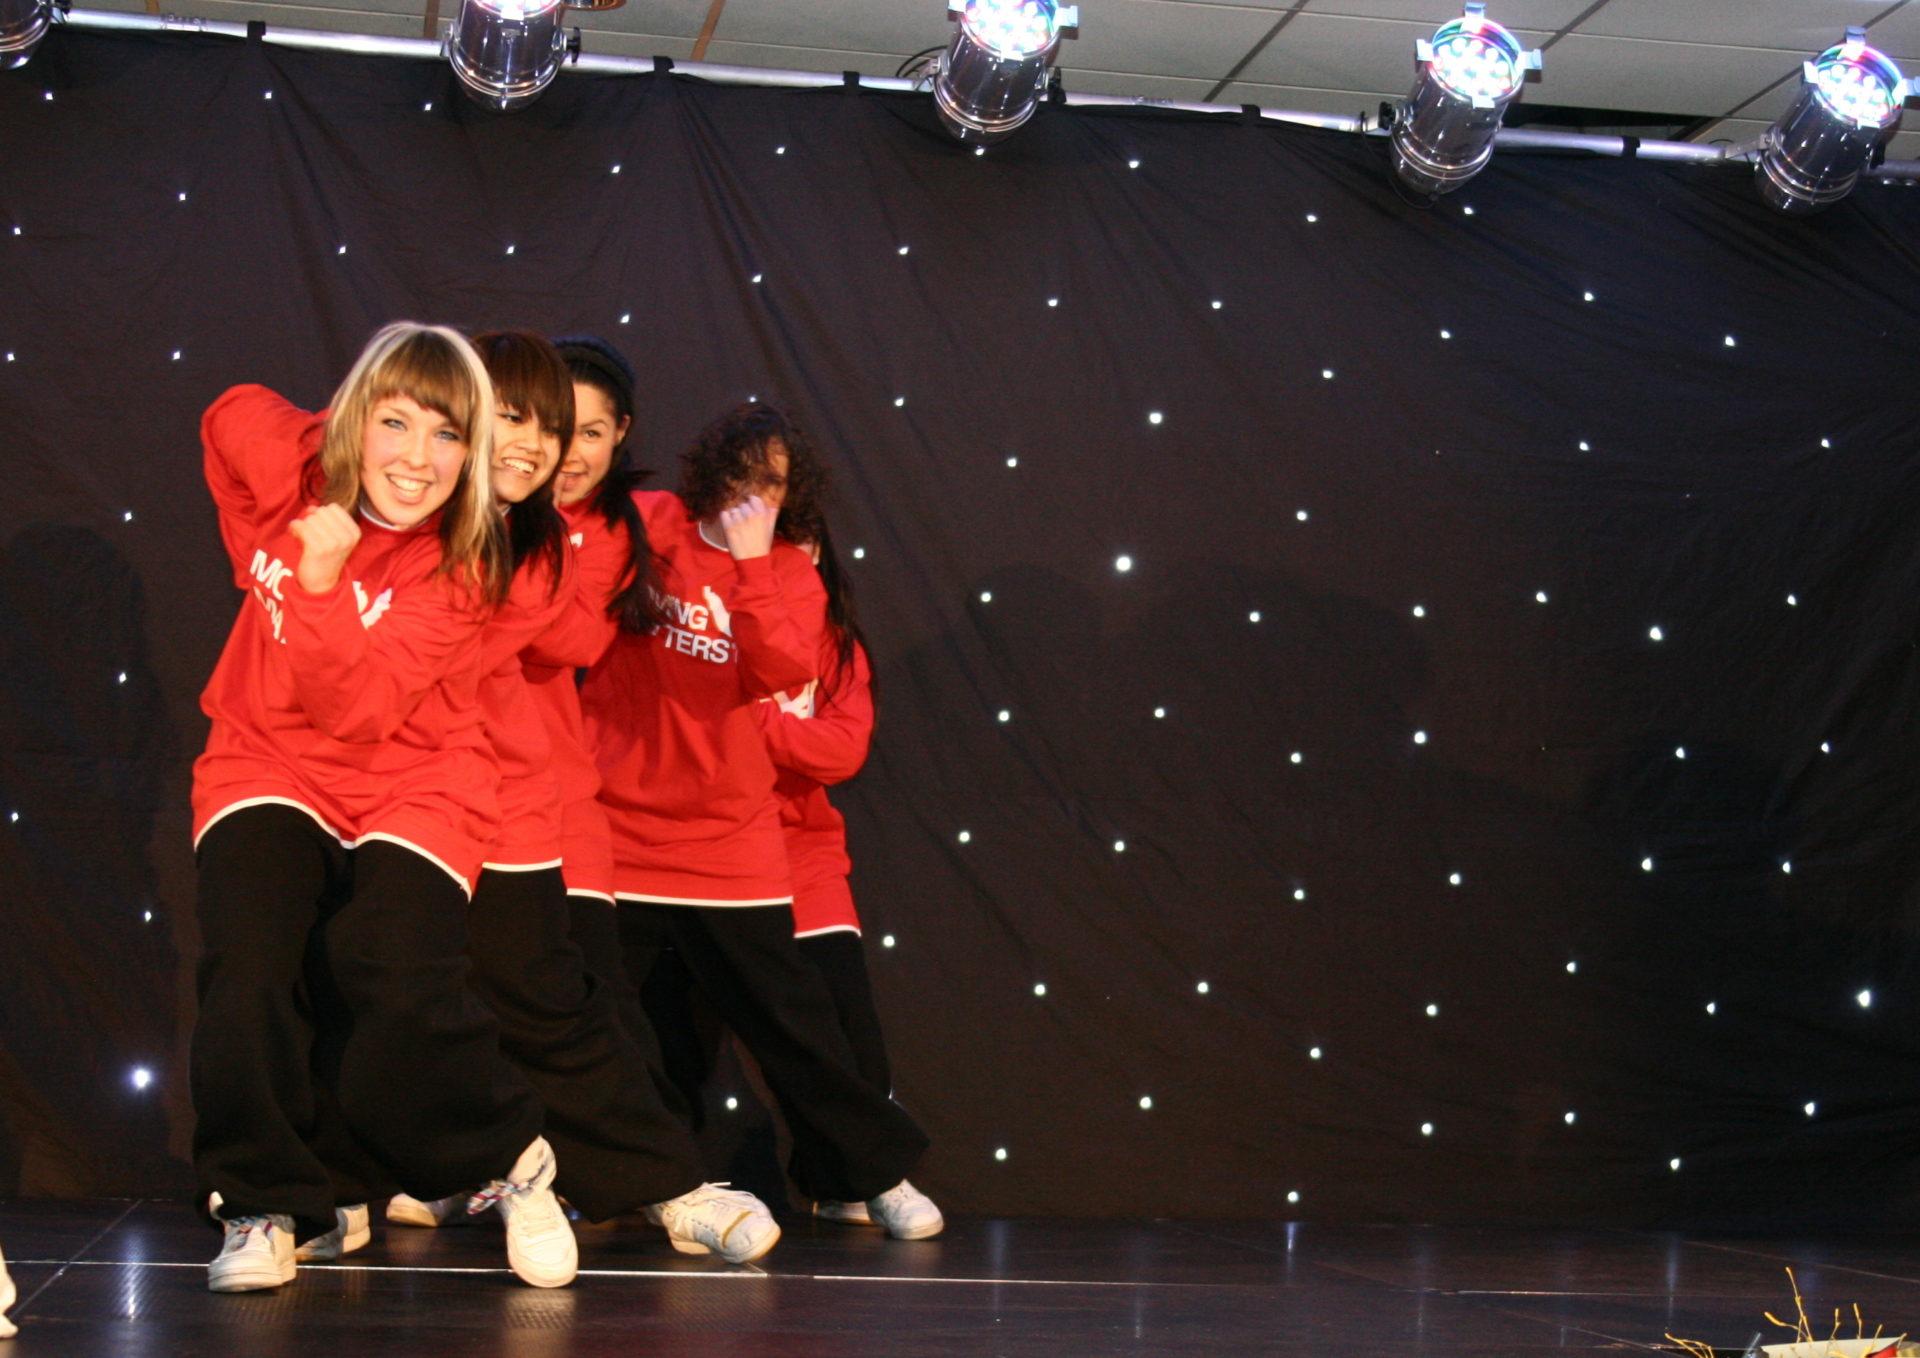 Sportgala dansschool MovingMatters, Hip Hop Urban optreden, showcase performance Nijmeegs sportgala NEC stadion dans